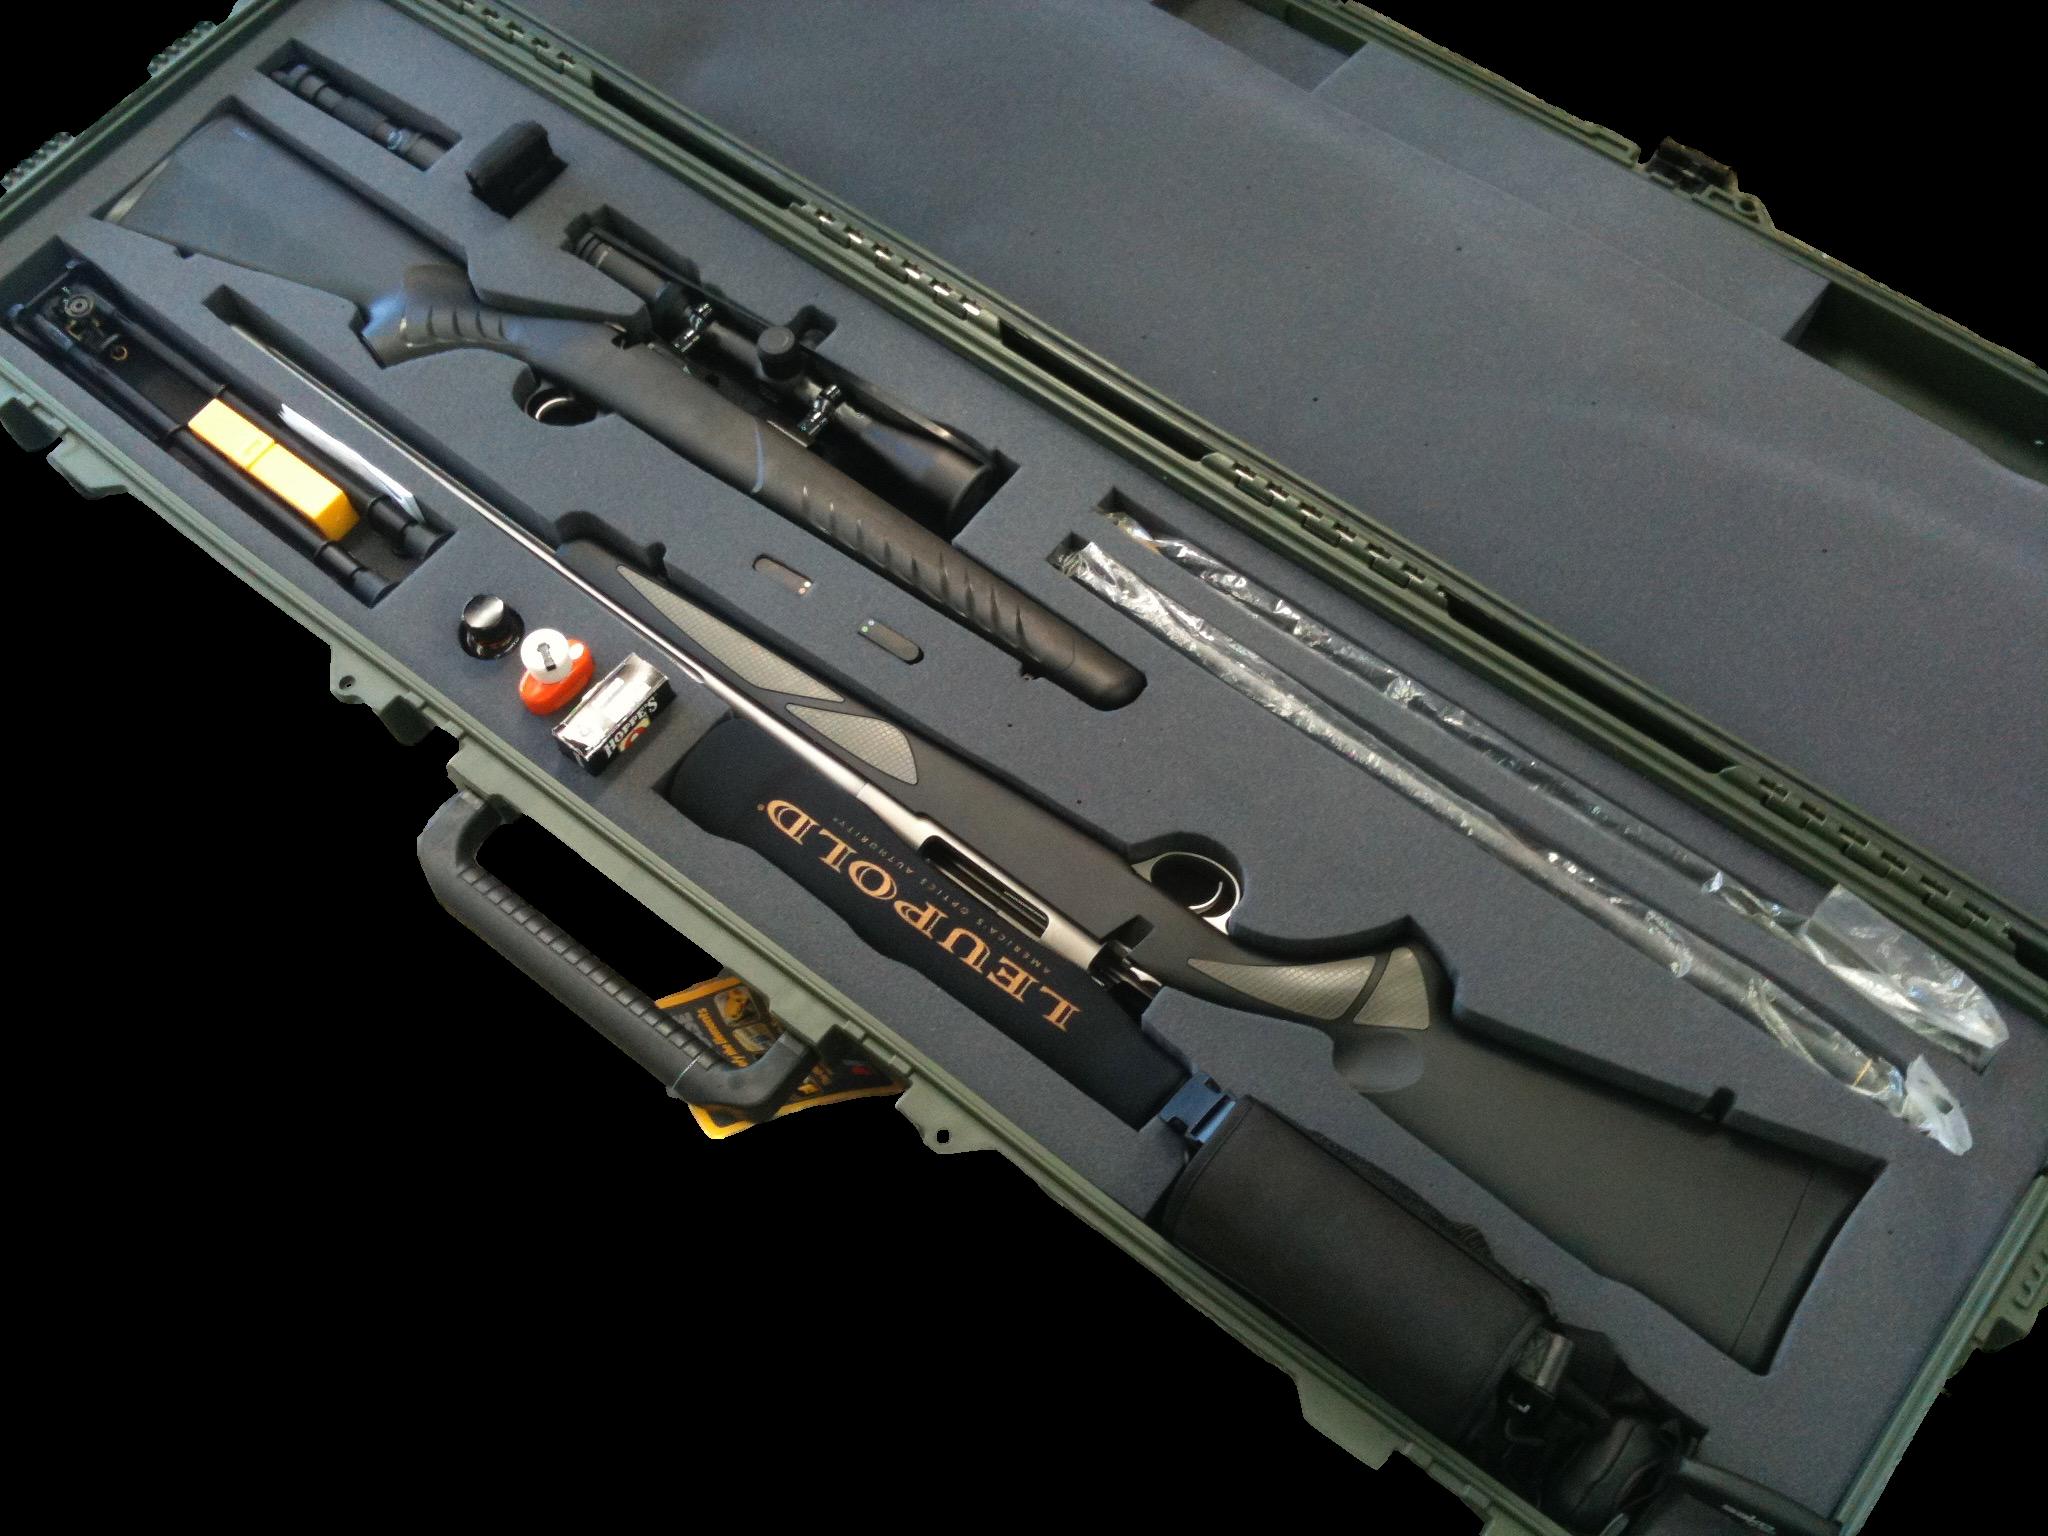 29-400 PU Rifle Case Insert